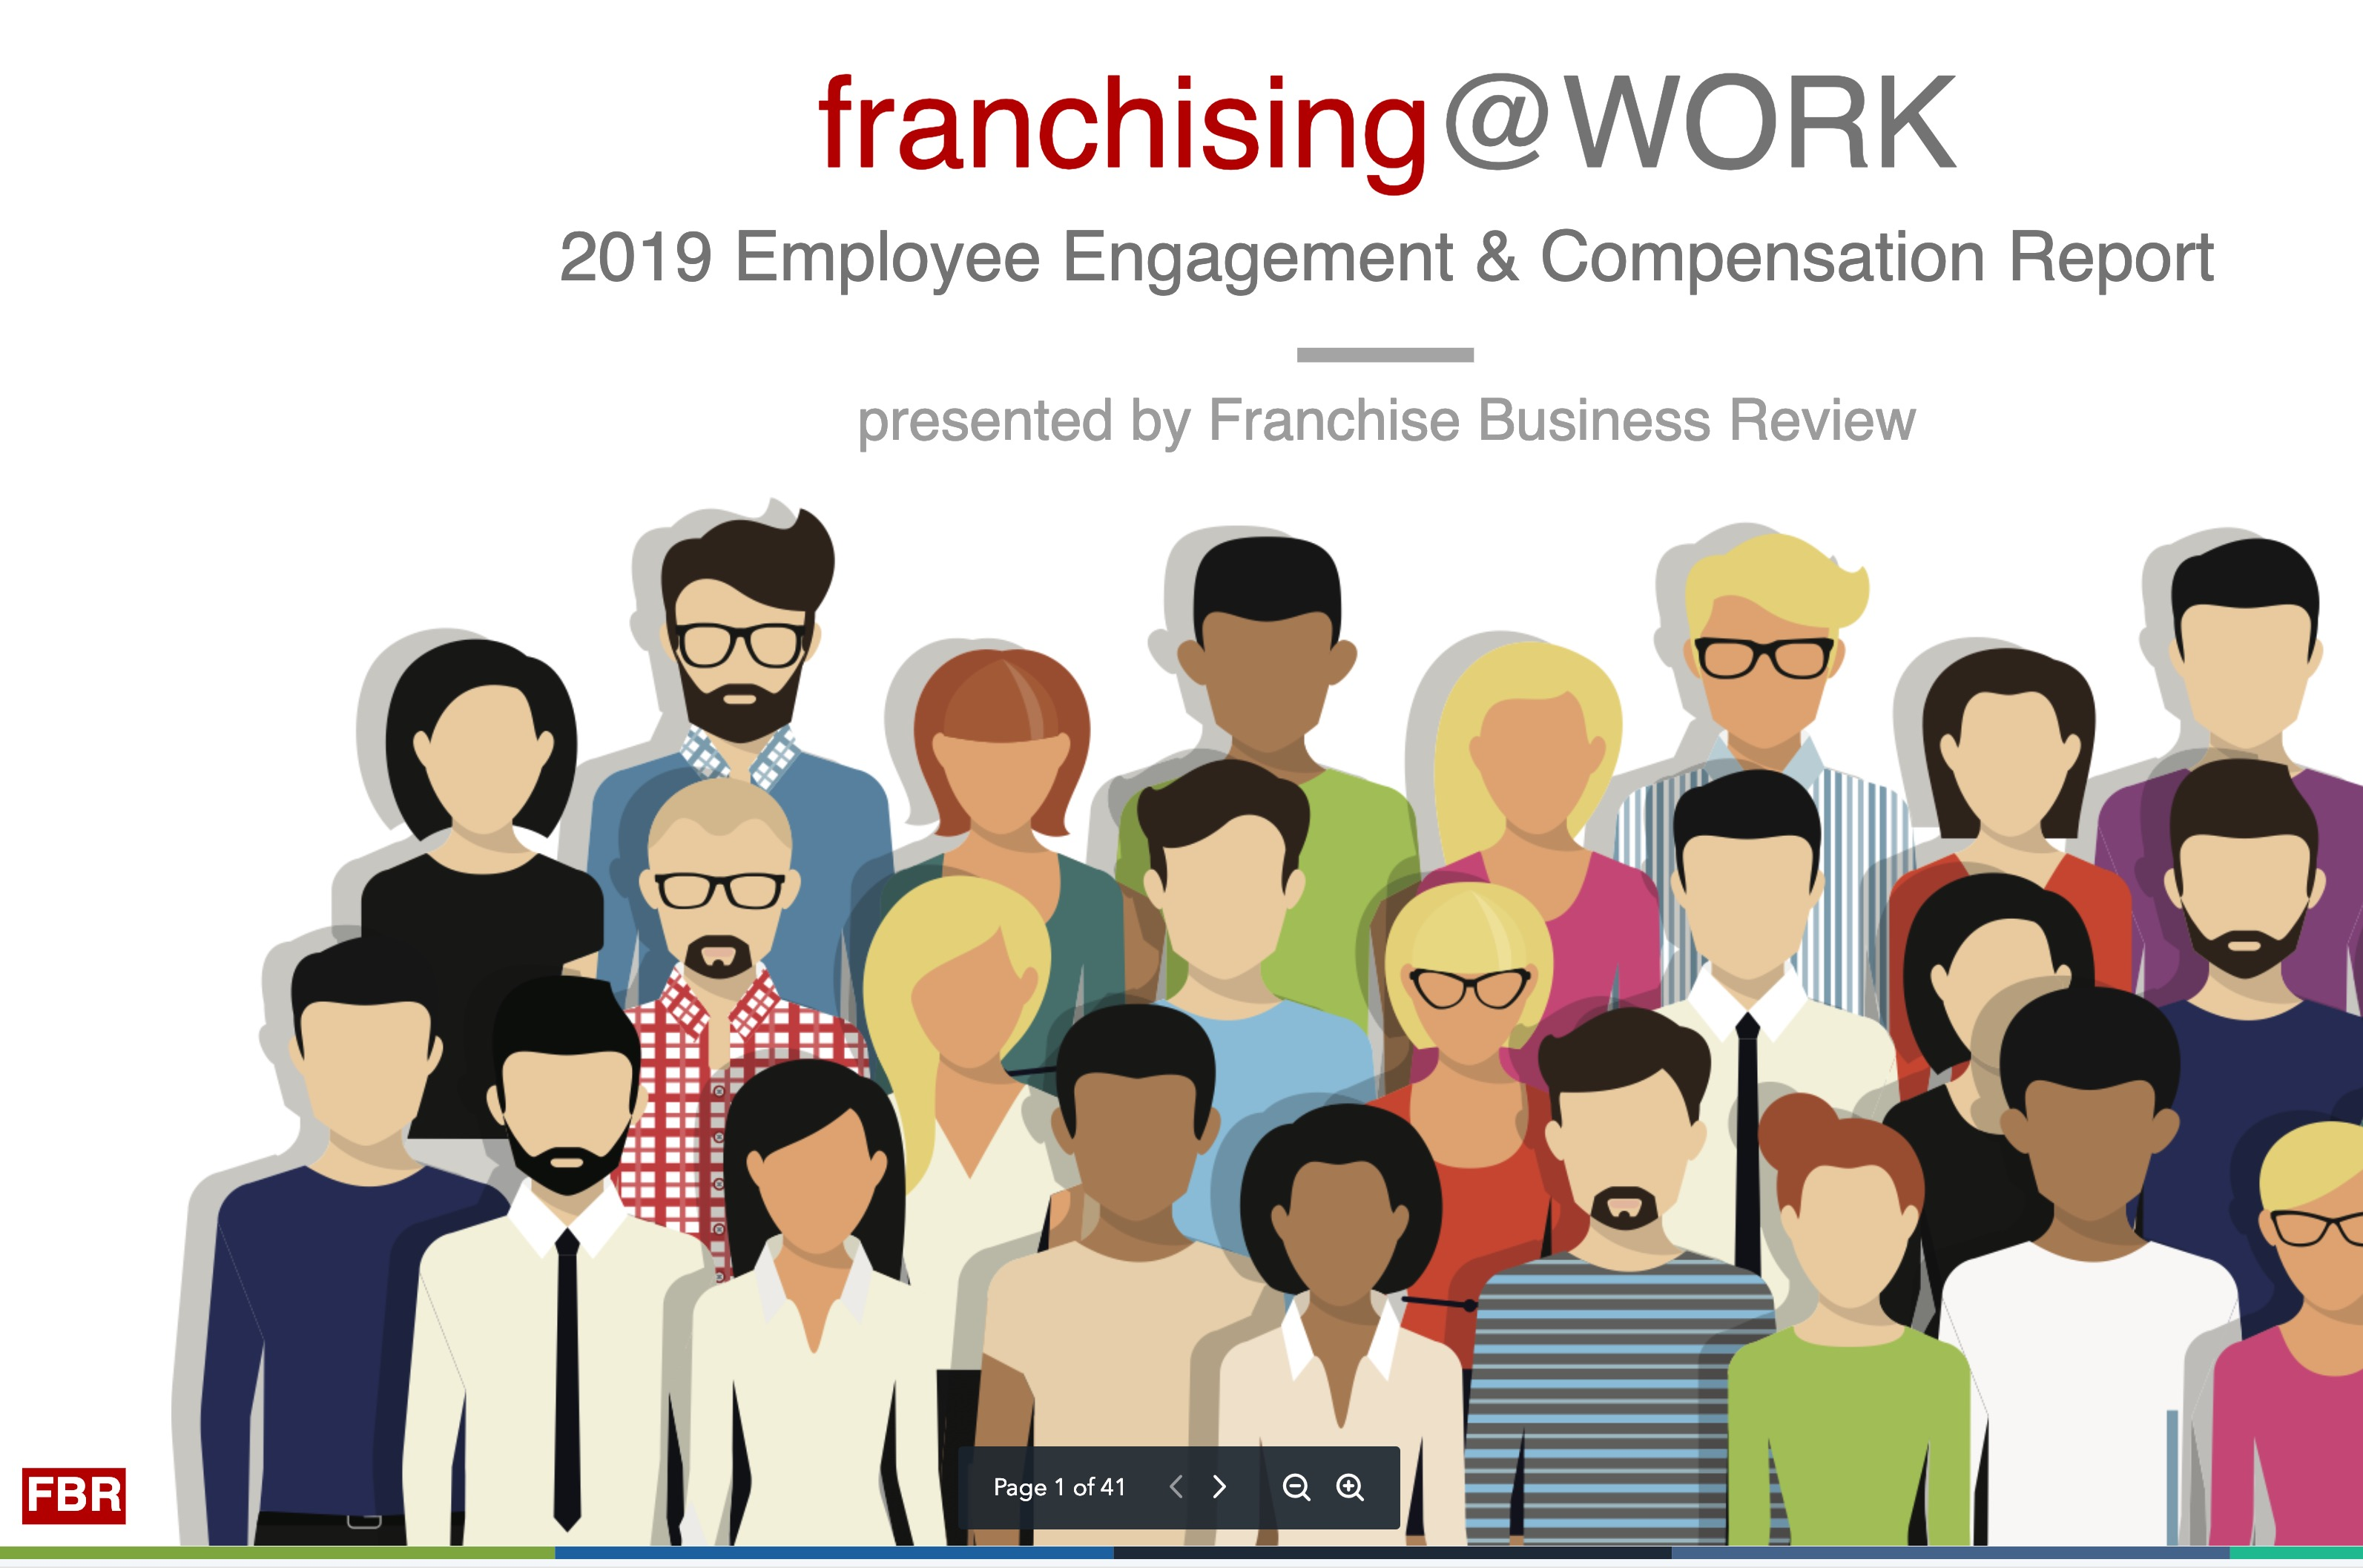 2019 Franchising@WORK Report